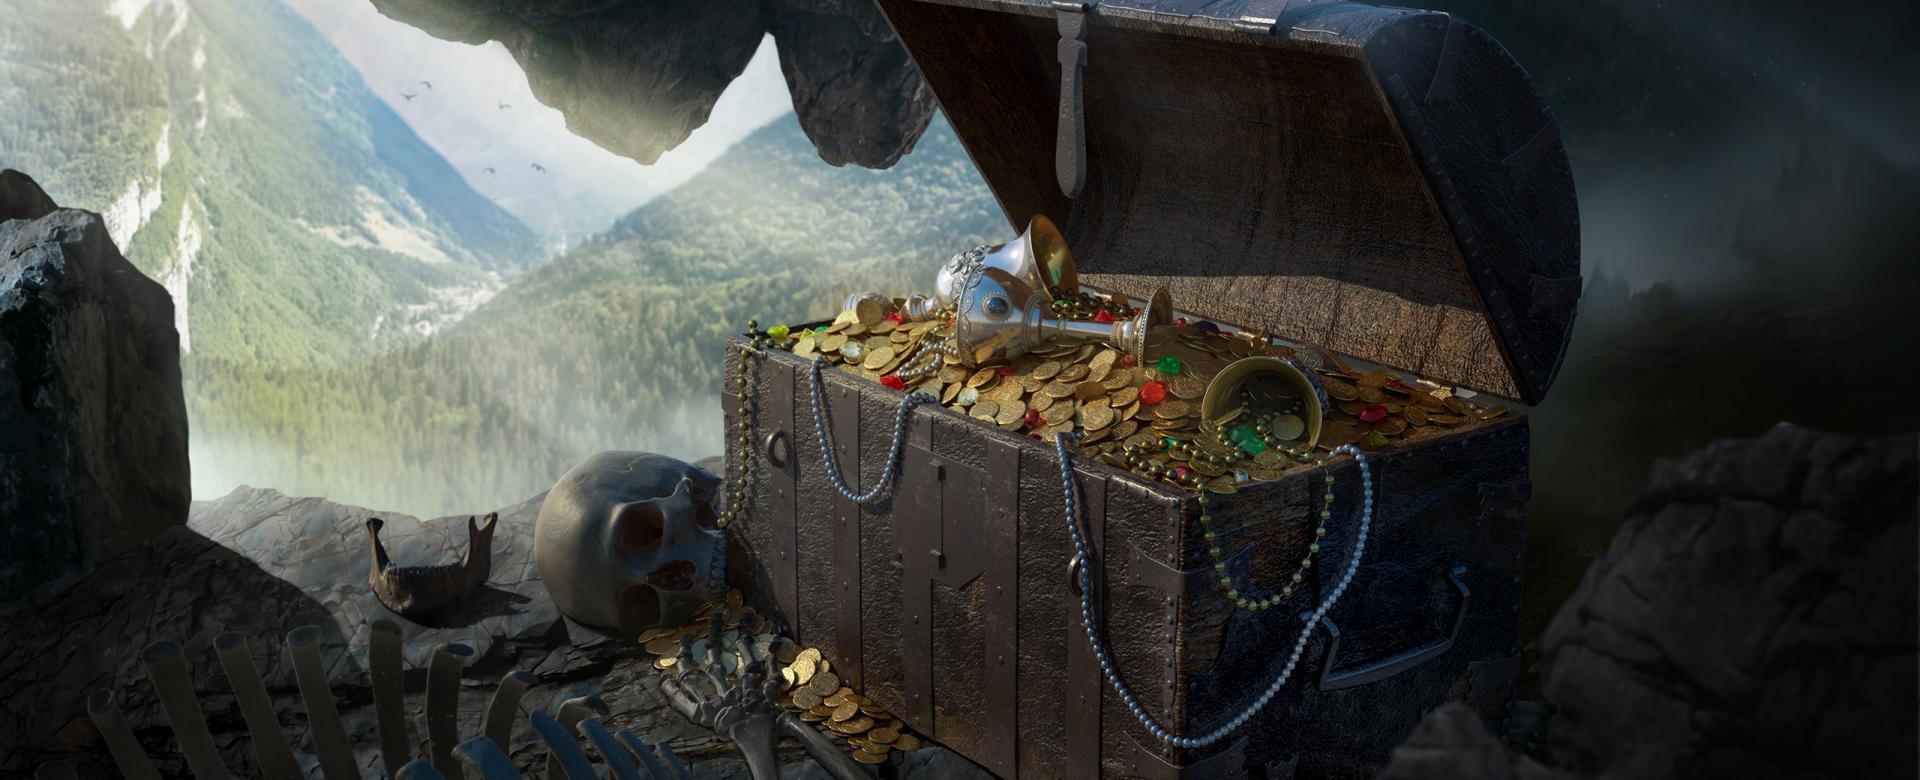 3D Treasure and bones in a cave scene